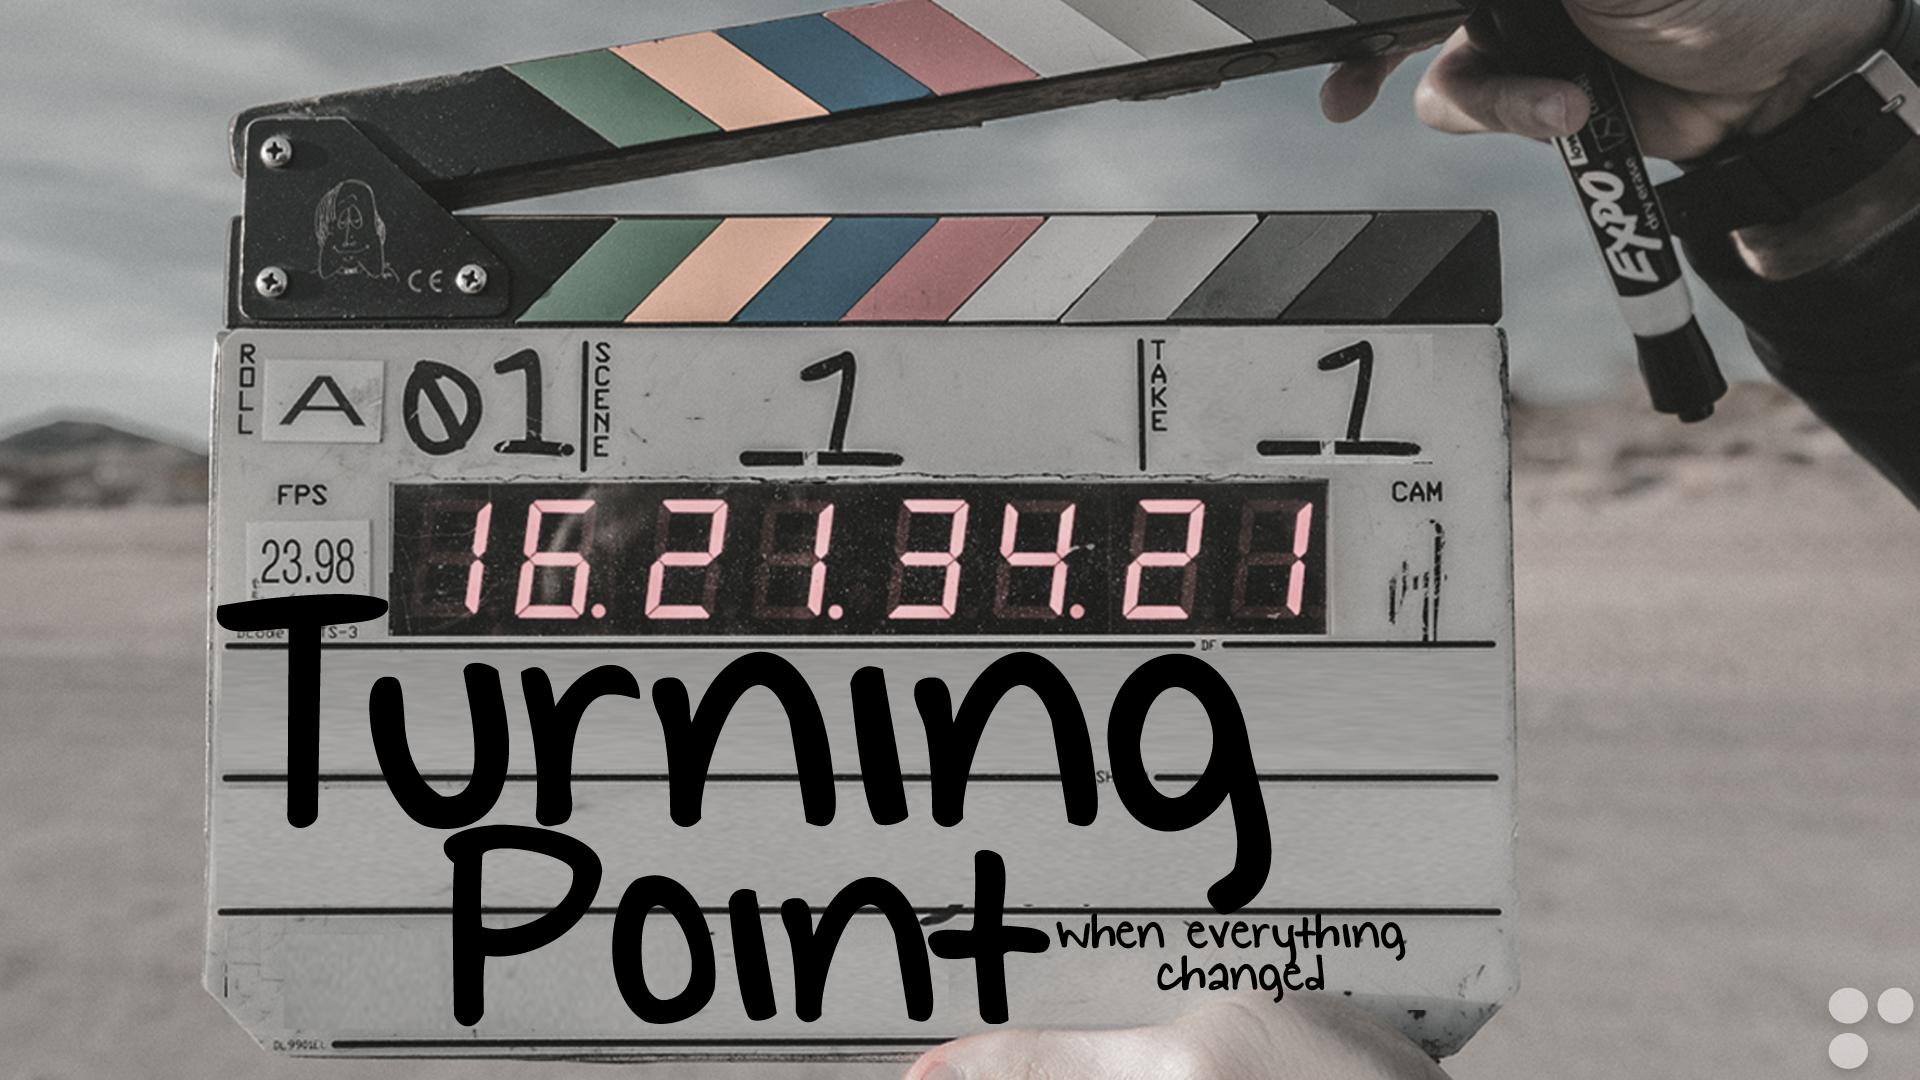 Turning Point - 1920x1080.jpg